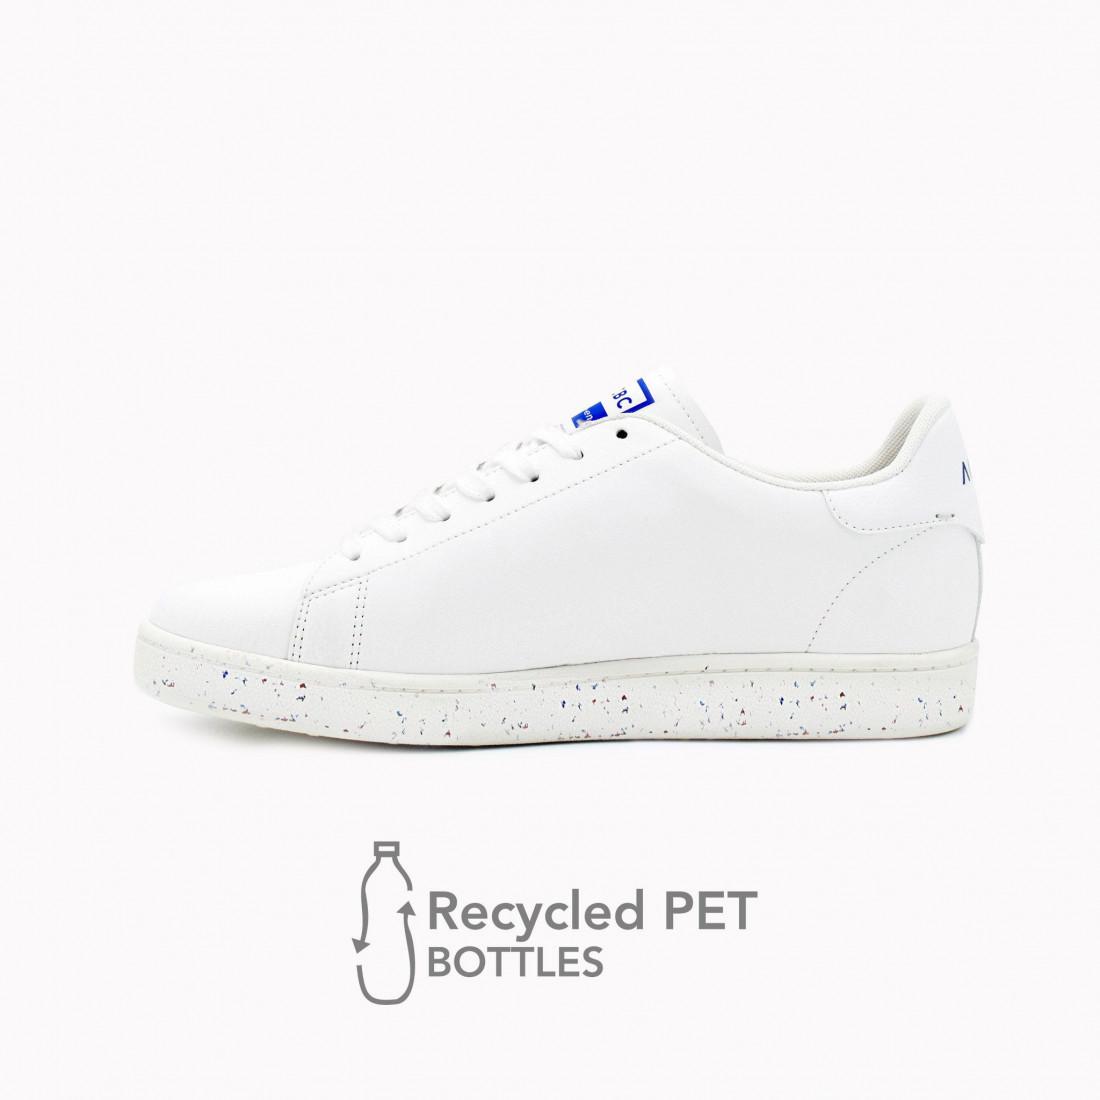 sneakers man acbc shtl eco m203 8638